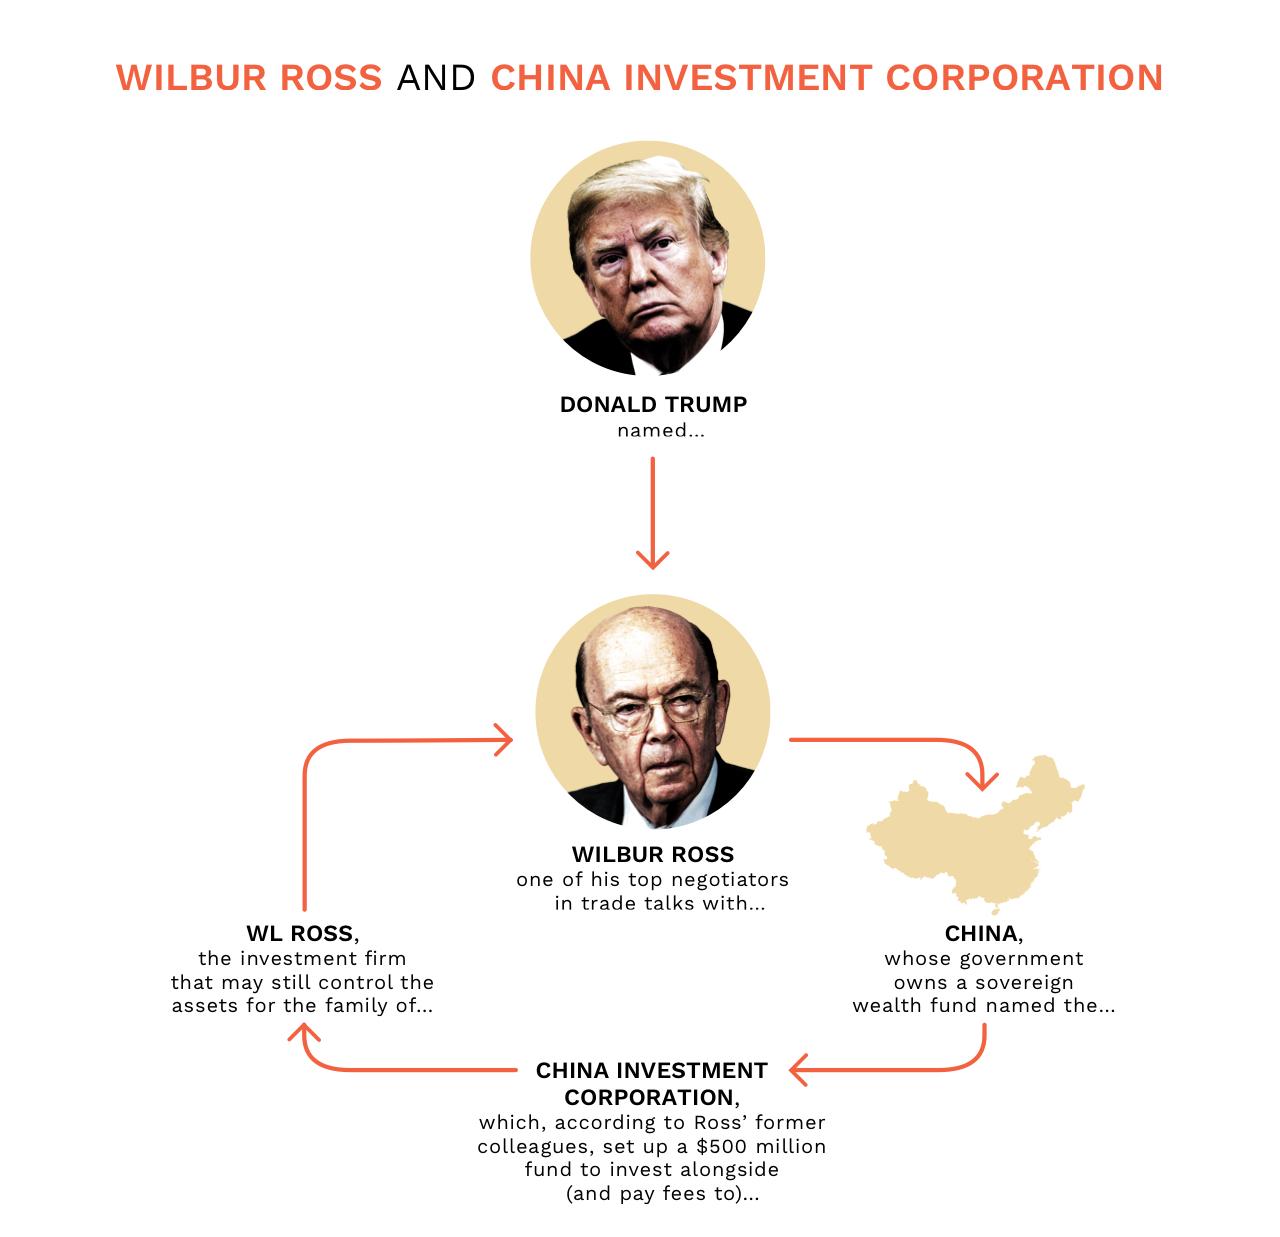 DCS-WilburRoss-ChinaInvestmentCorporation-v7.jpg